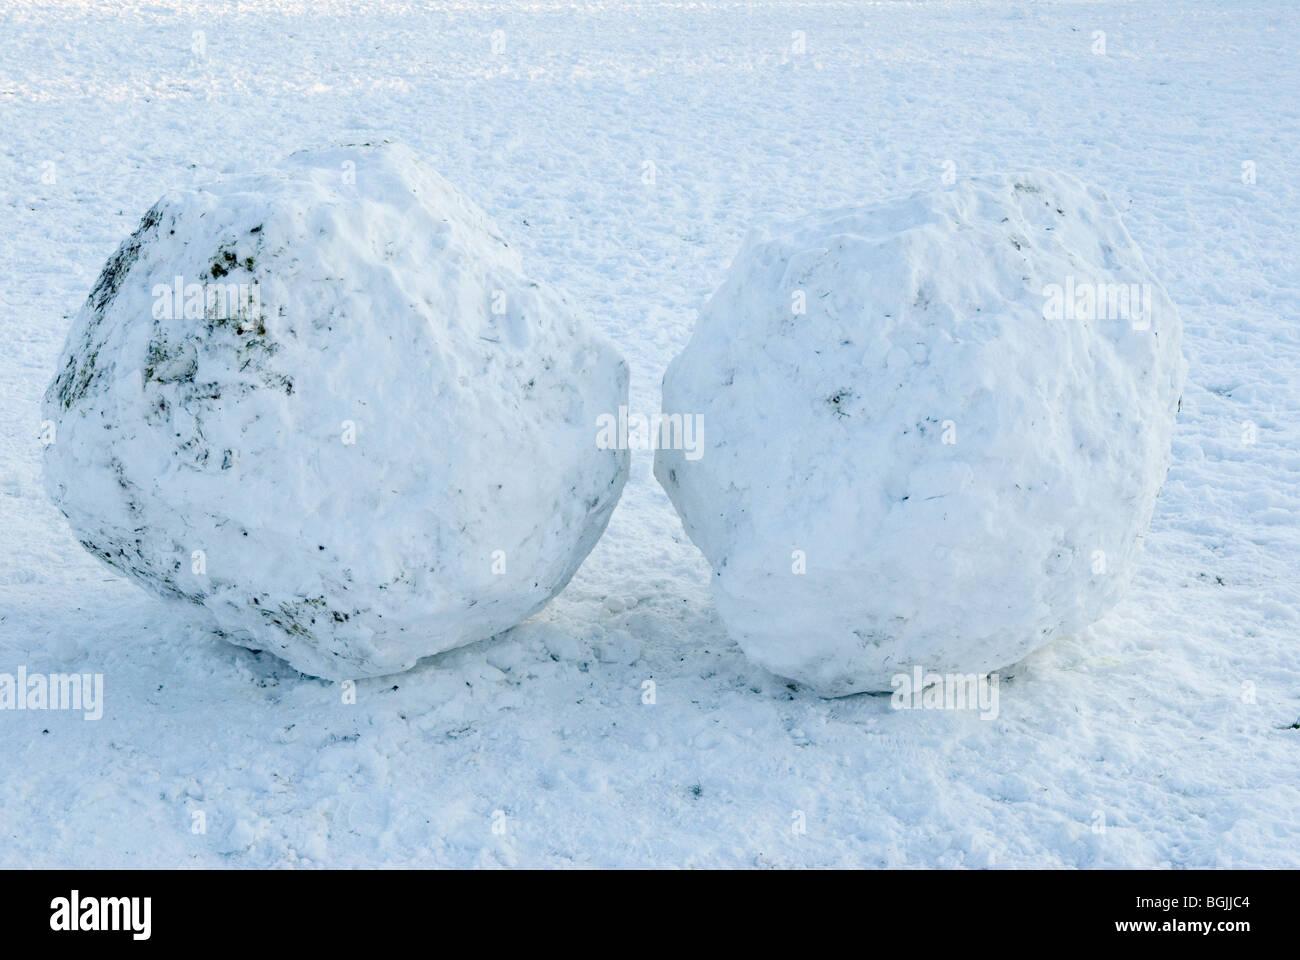 snowballs snowball - Stock Image